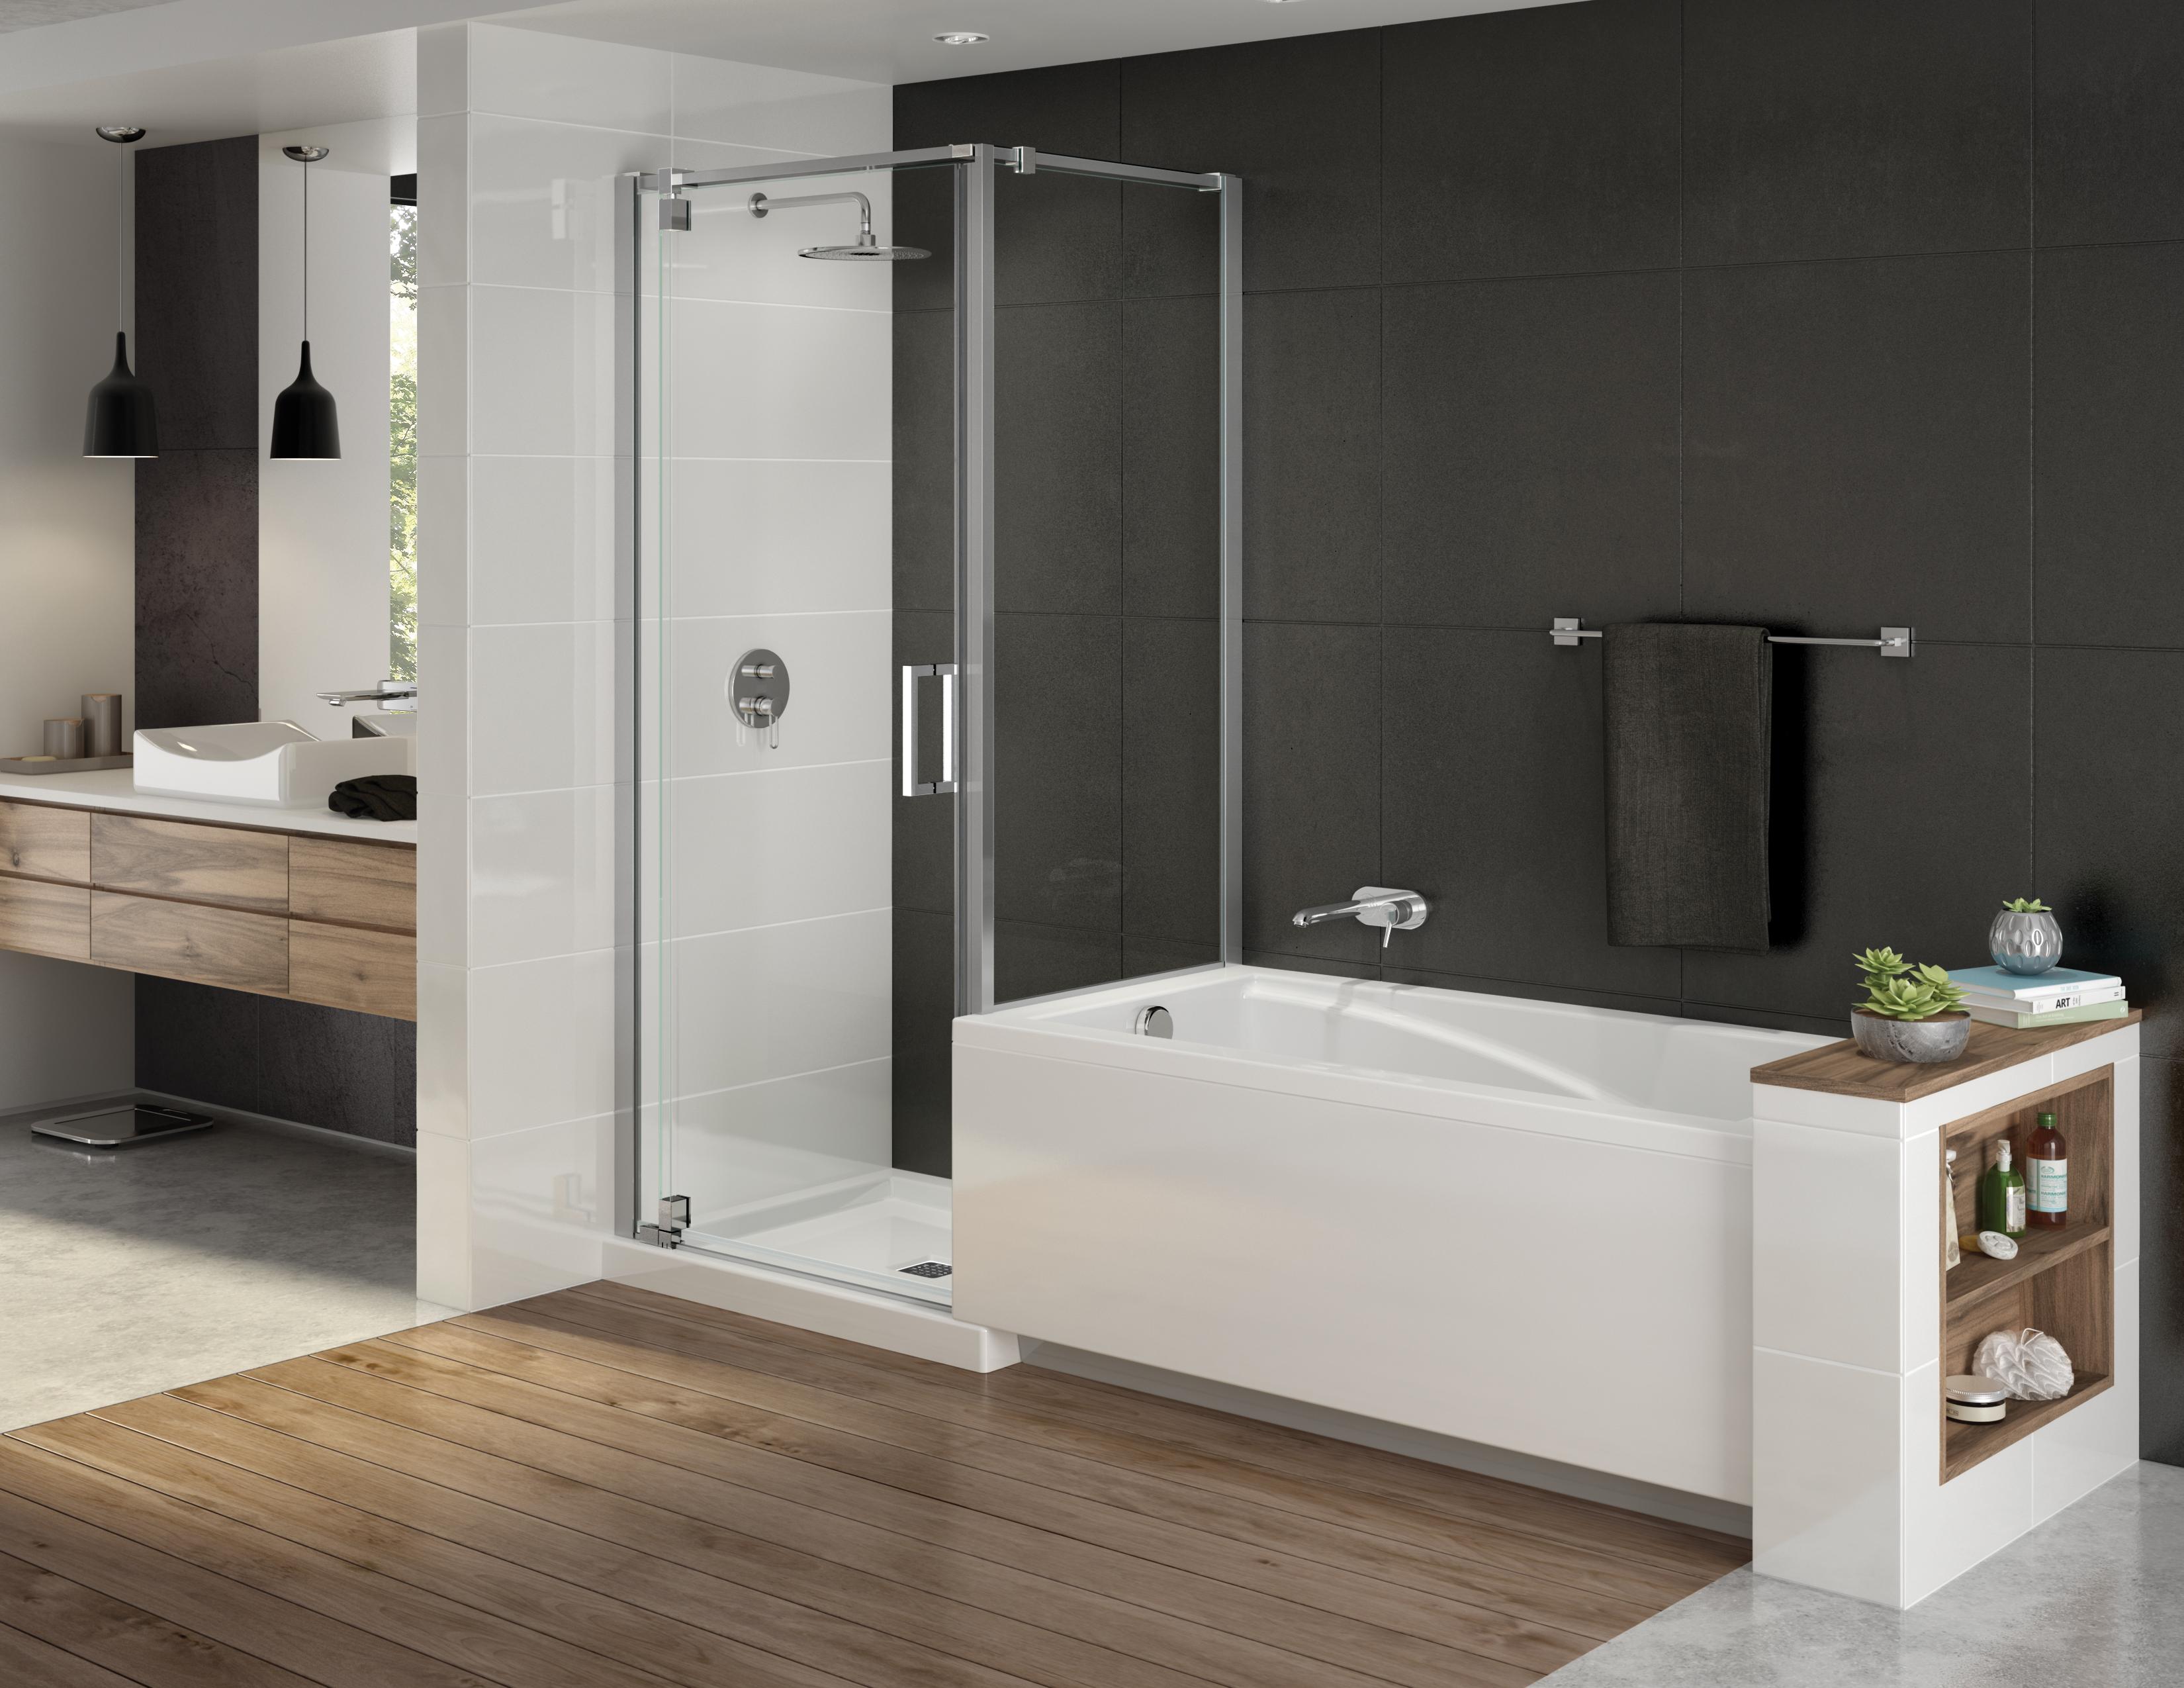 A\' Design Award and Competition - Profile: Maax (Maax Bath Inc)